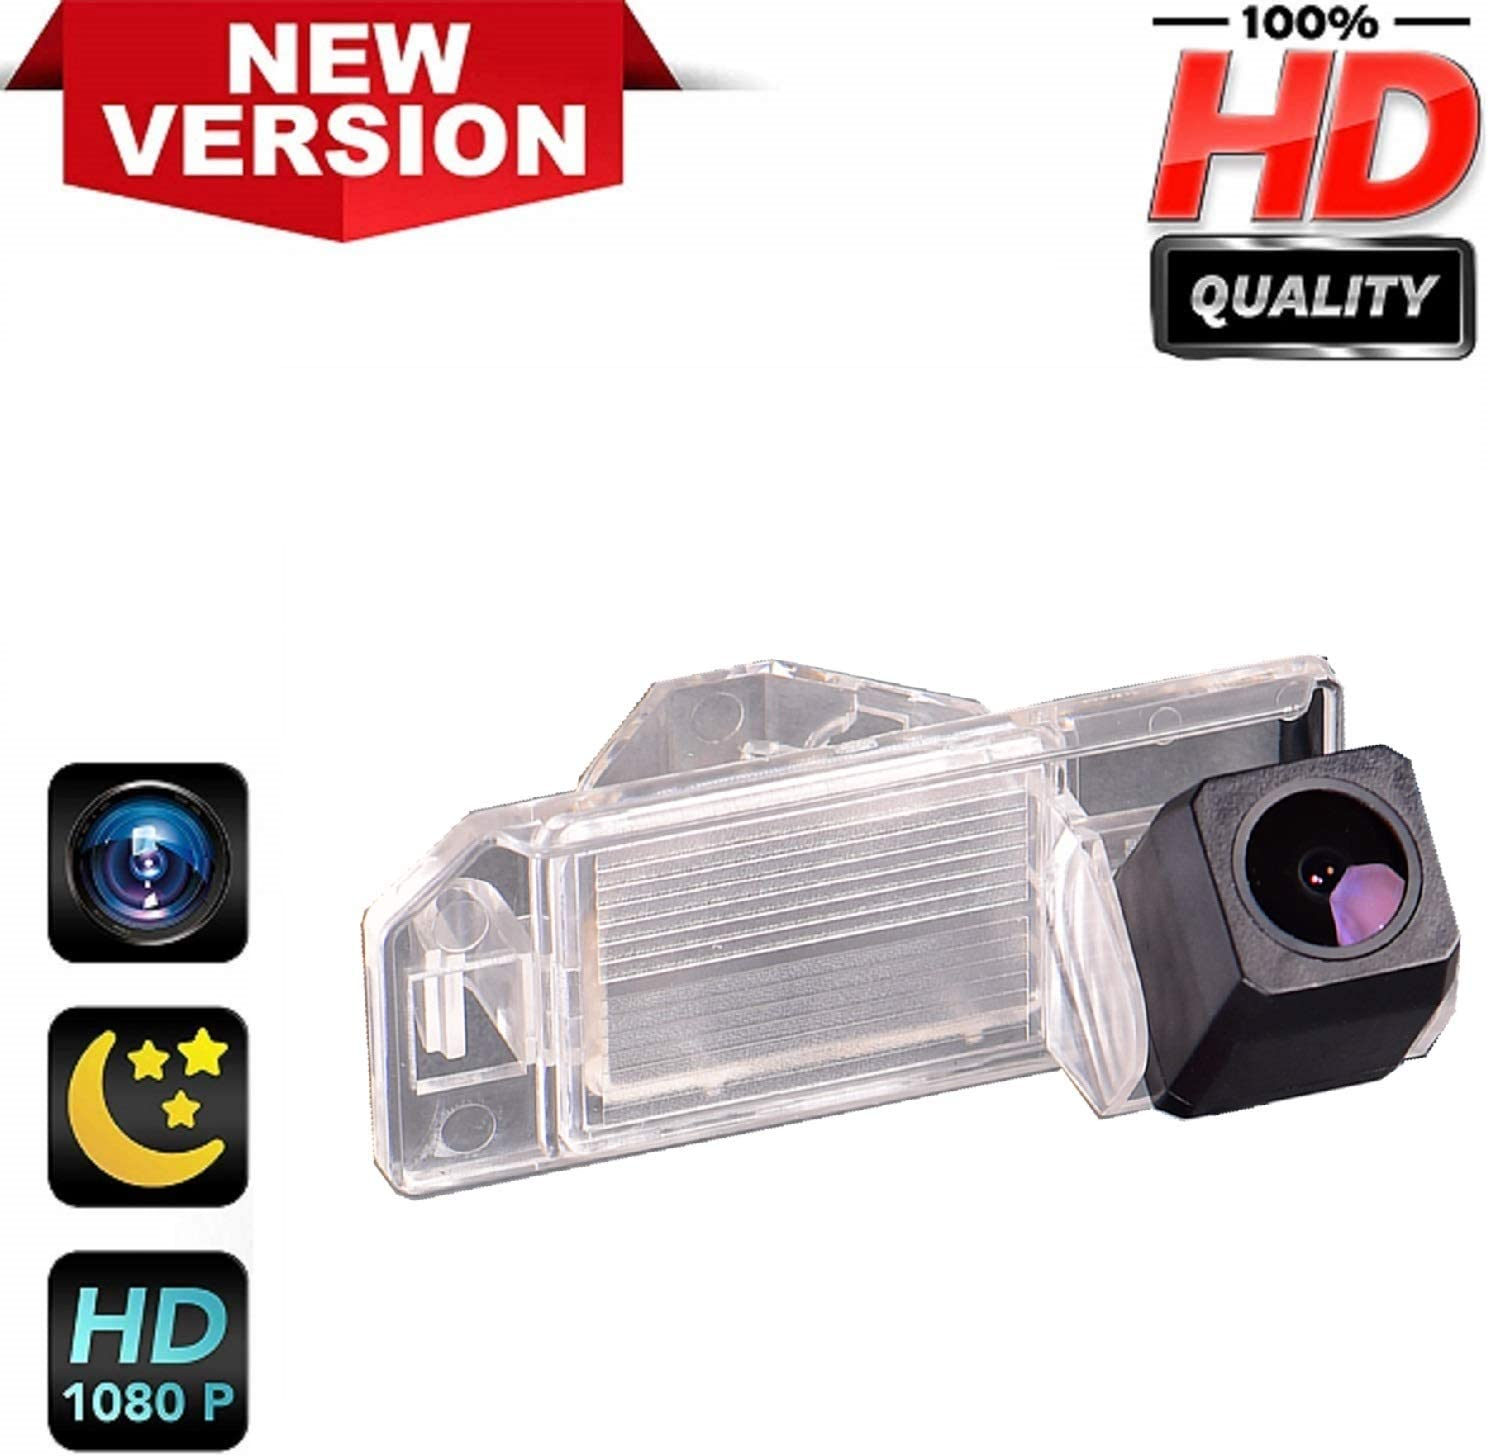 HD 720p Reversing Camera in Number Plate Light License Rear View Backup camera for Mitsubishi ASX RVR Outlander Sport CS6 Citroen C4 Aircross Peugeot 4008 2010~2015